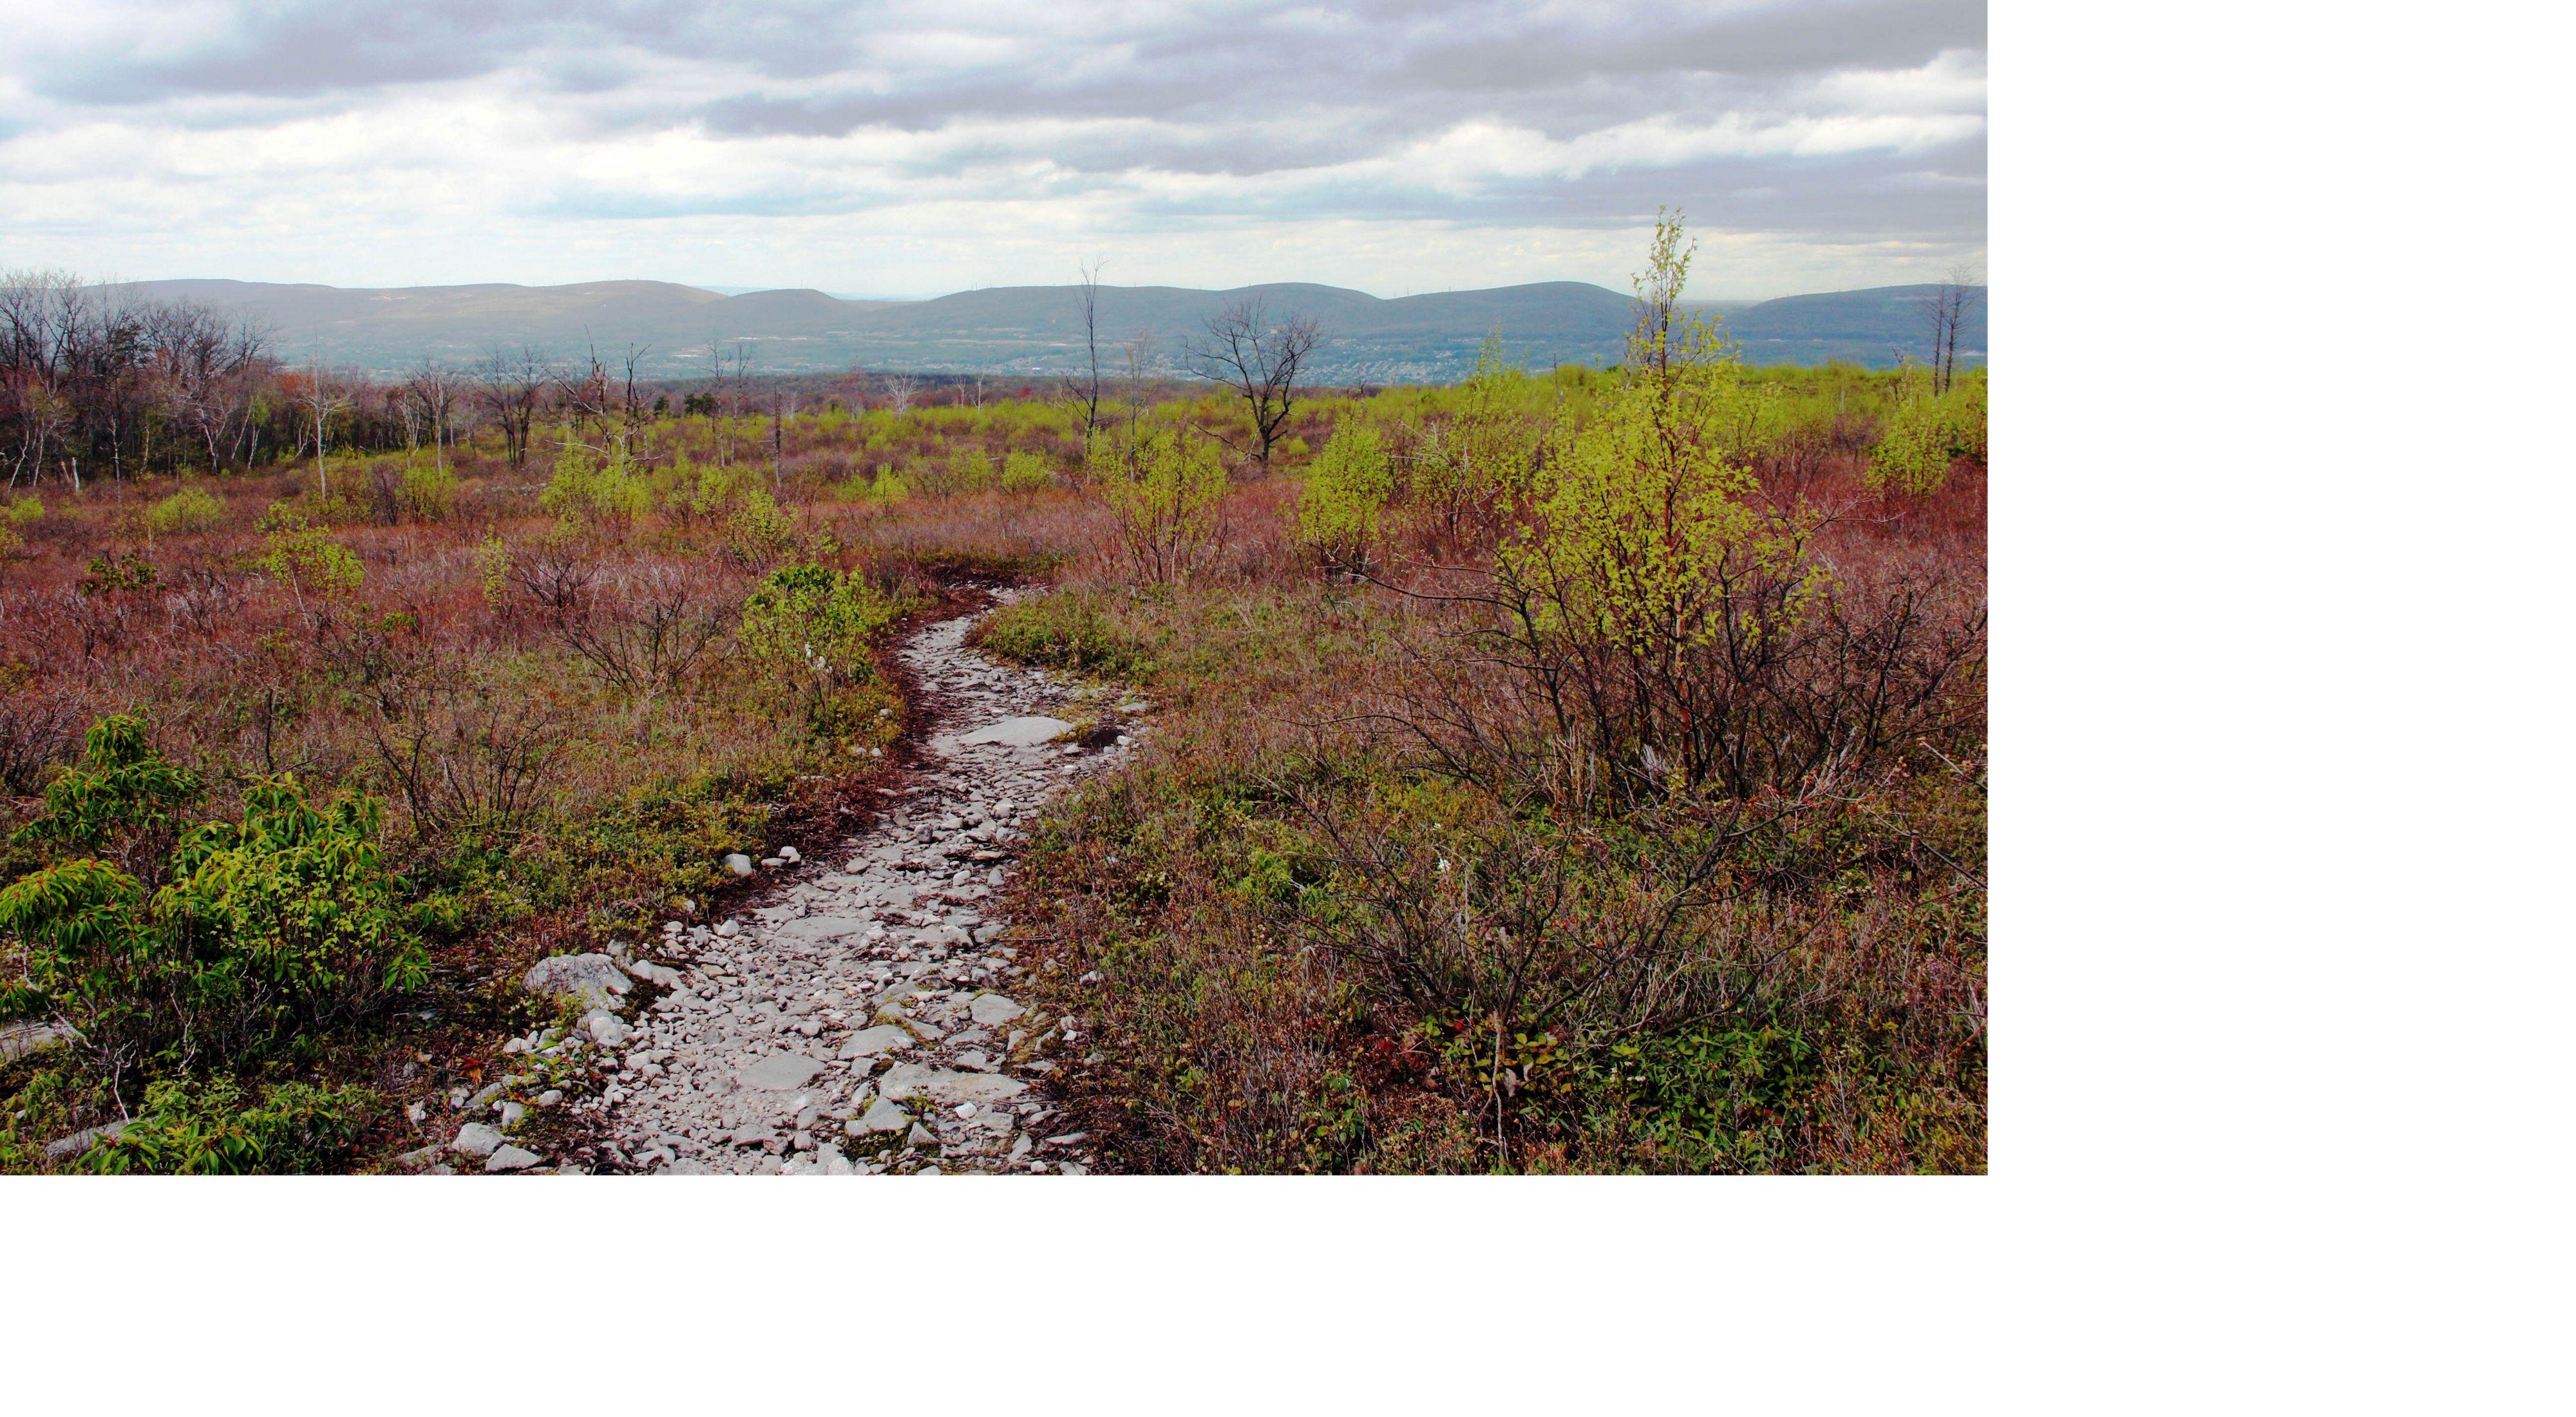 A dirt path winds through a colorful barrens landscape.